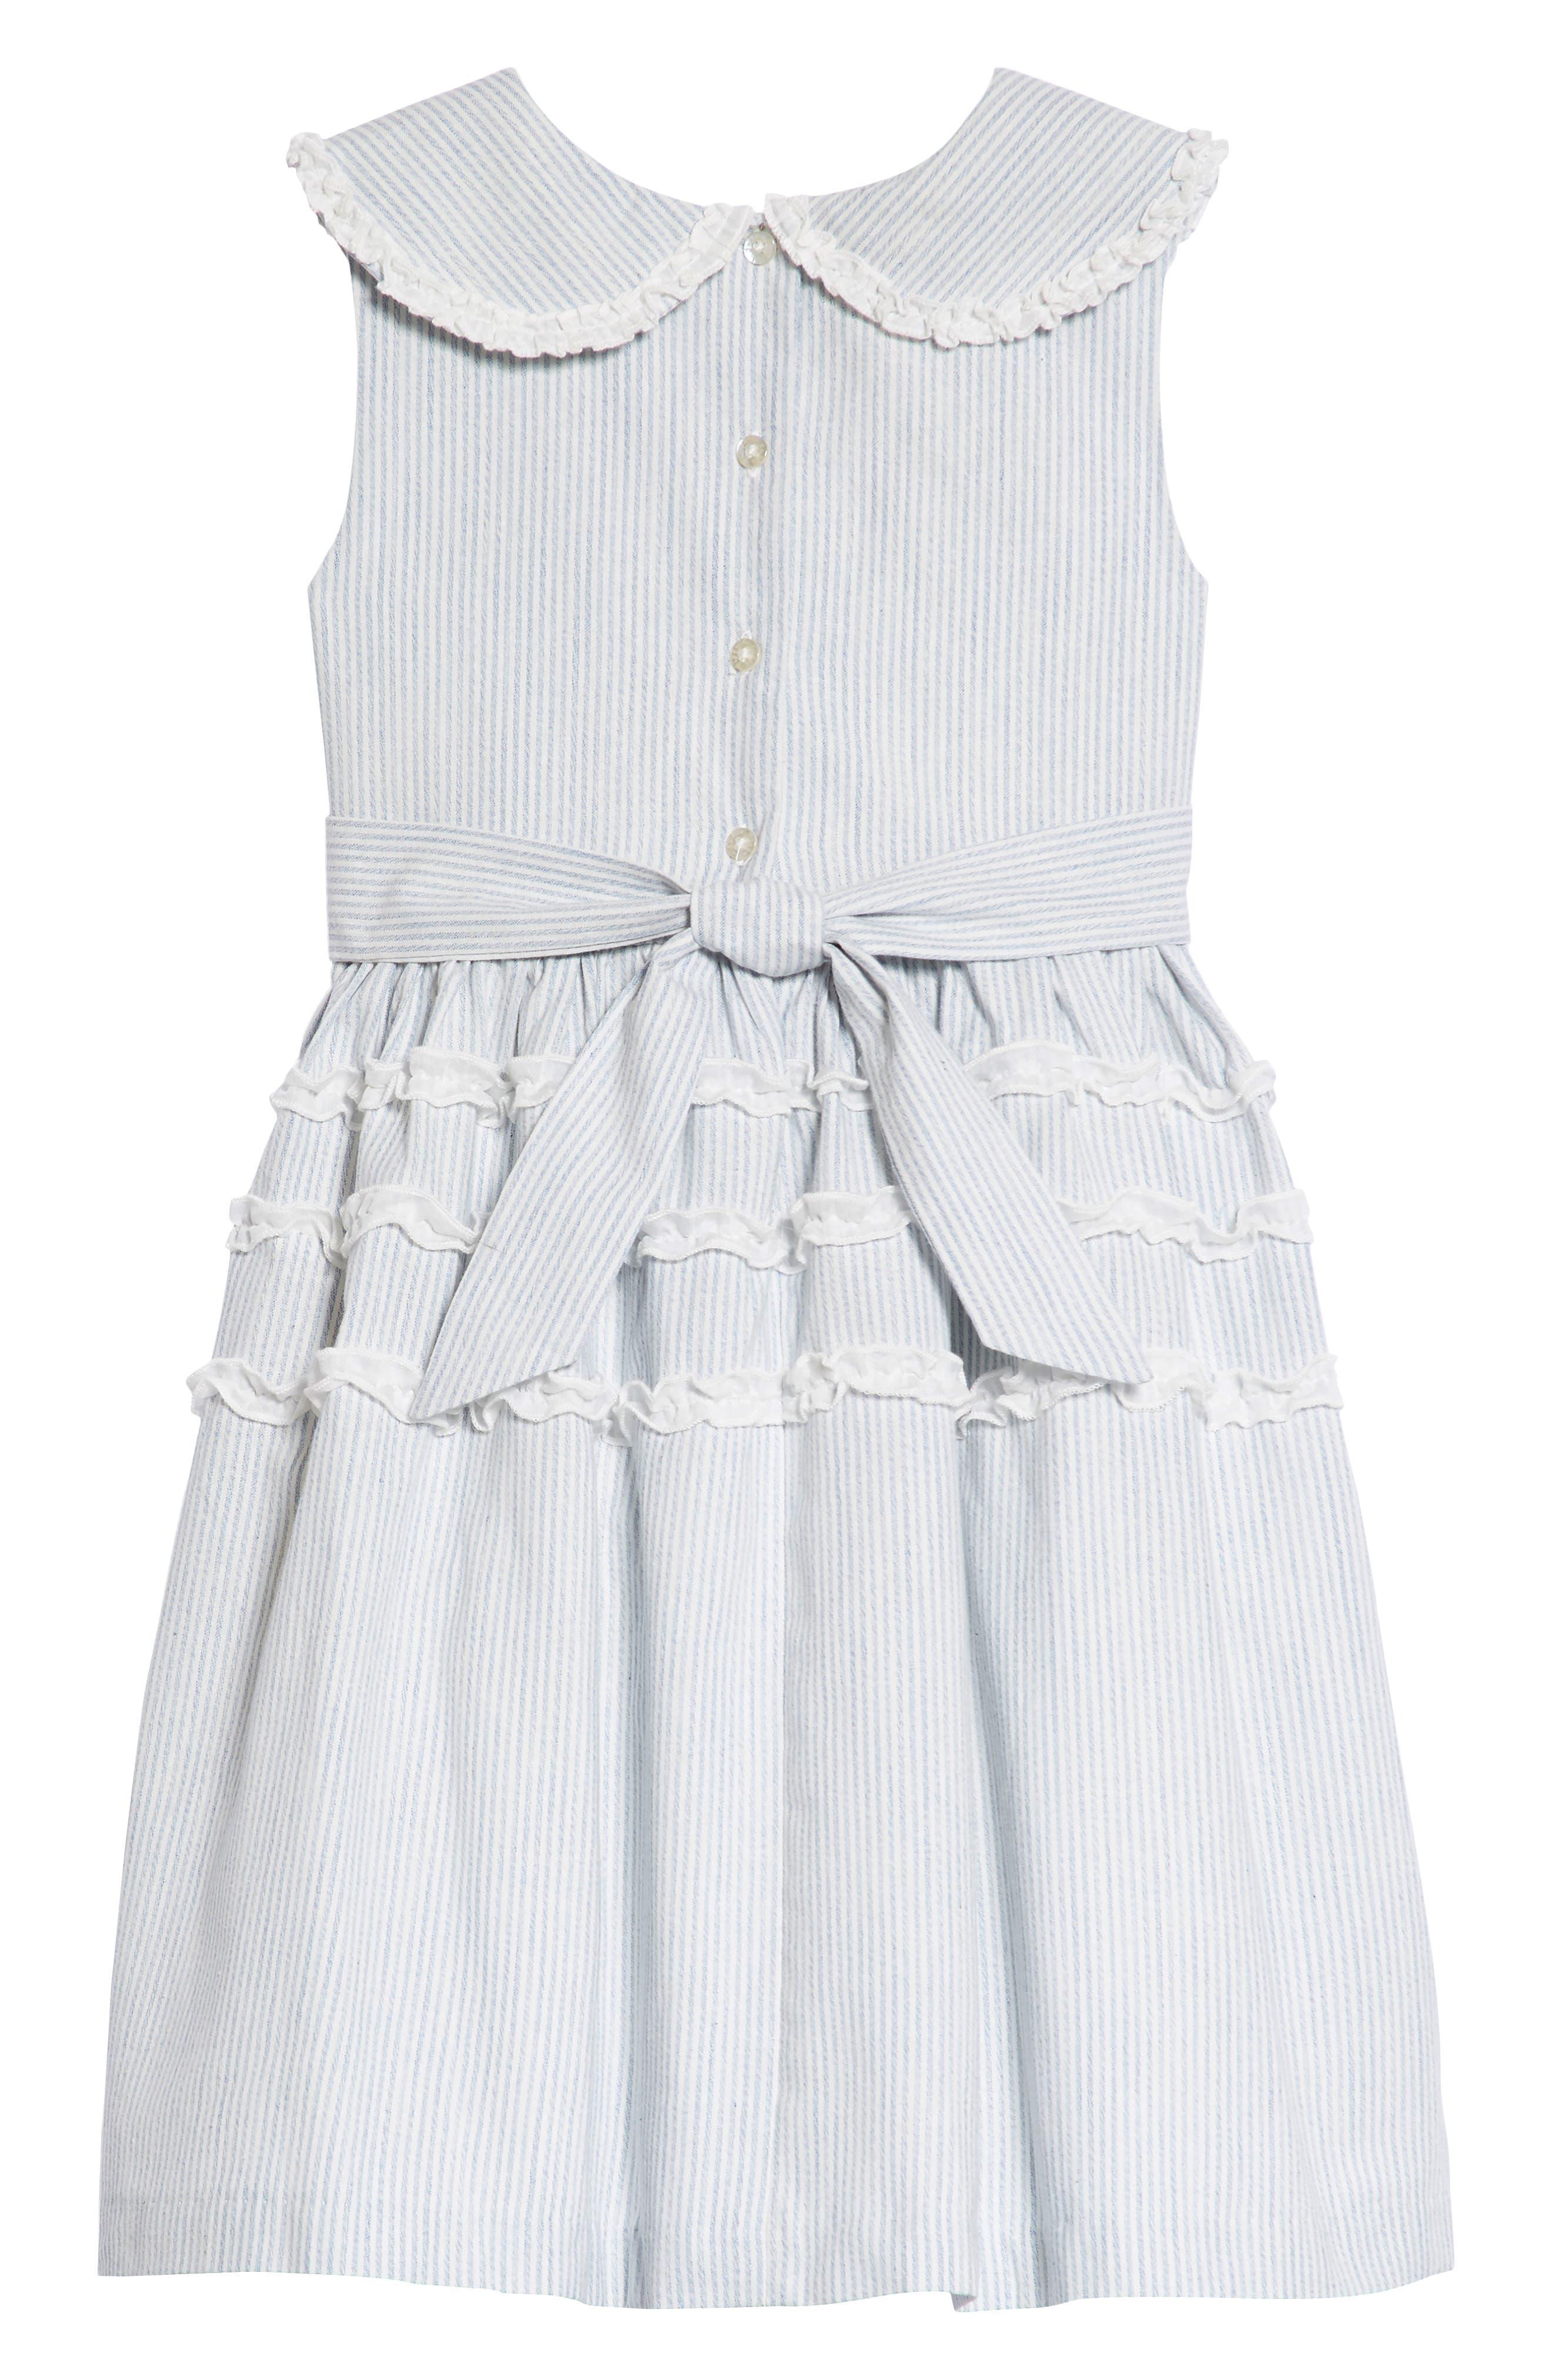 Stripe Ruffle Dress,                             Alternate thumbnail 2, color,                             402